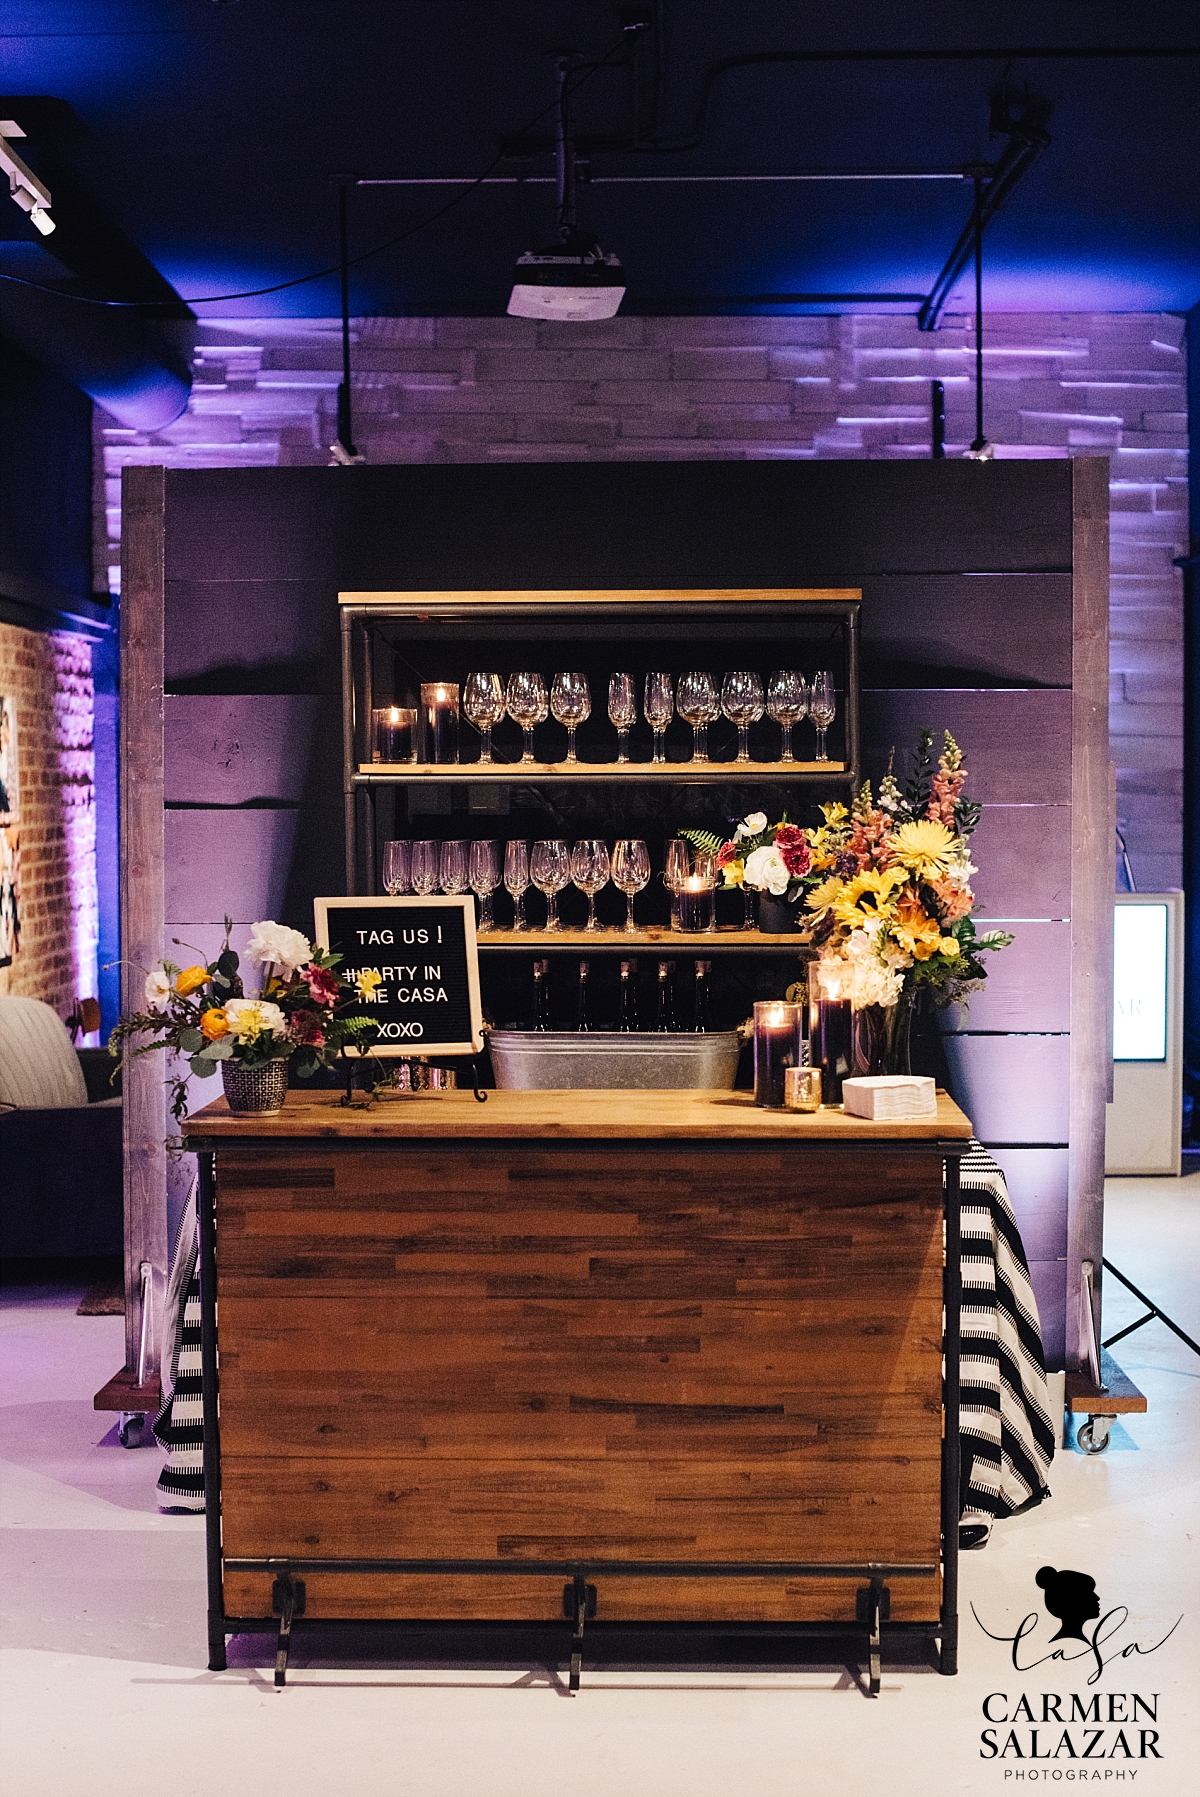 Party bar at photo studio grand opening - Carmen Salazar Photography